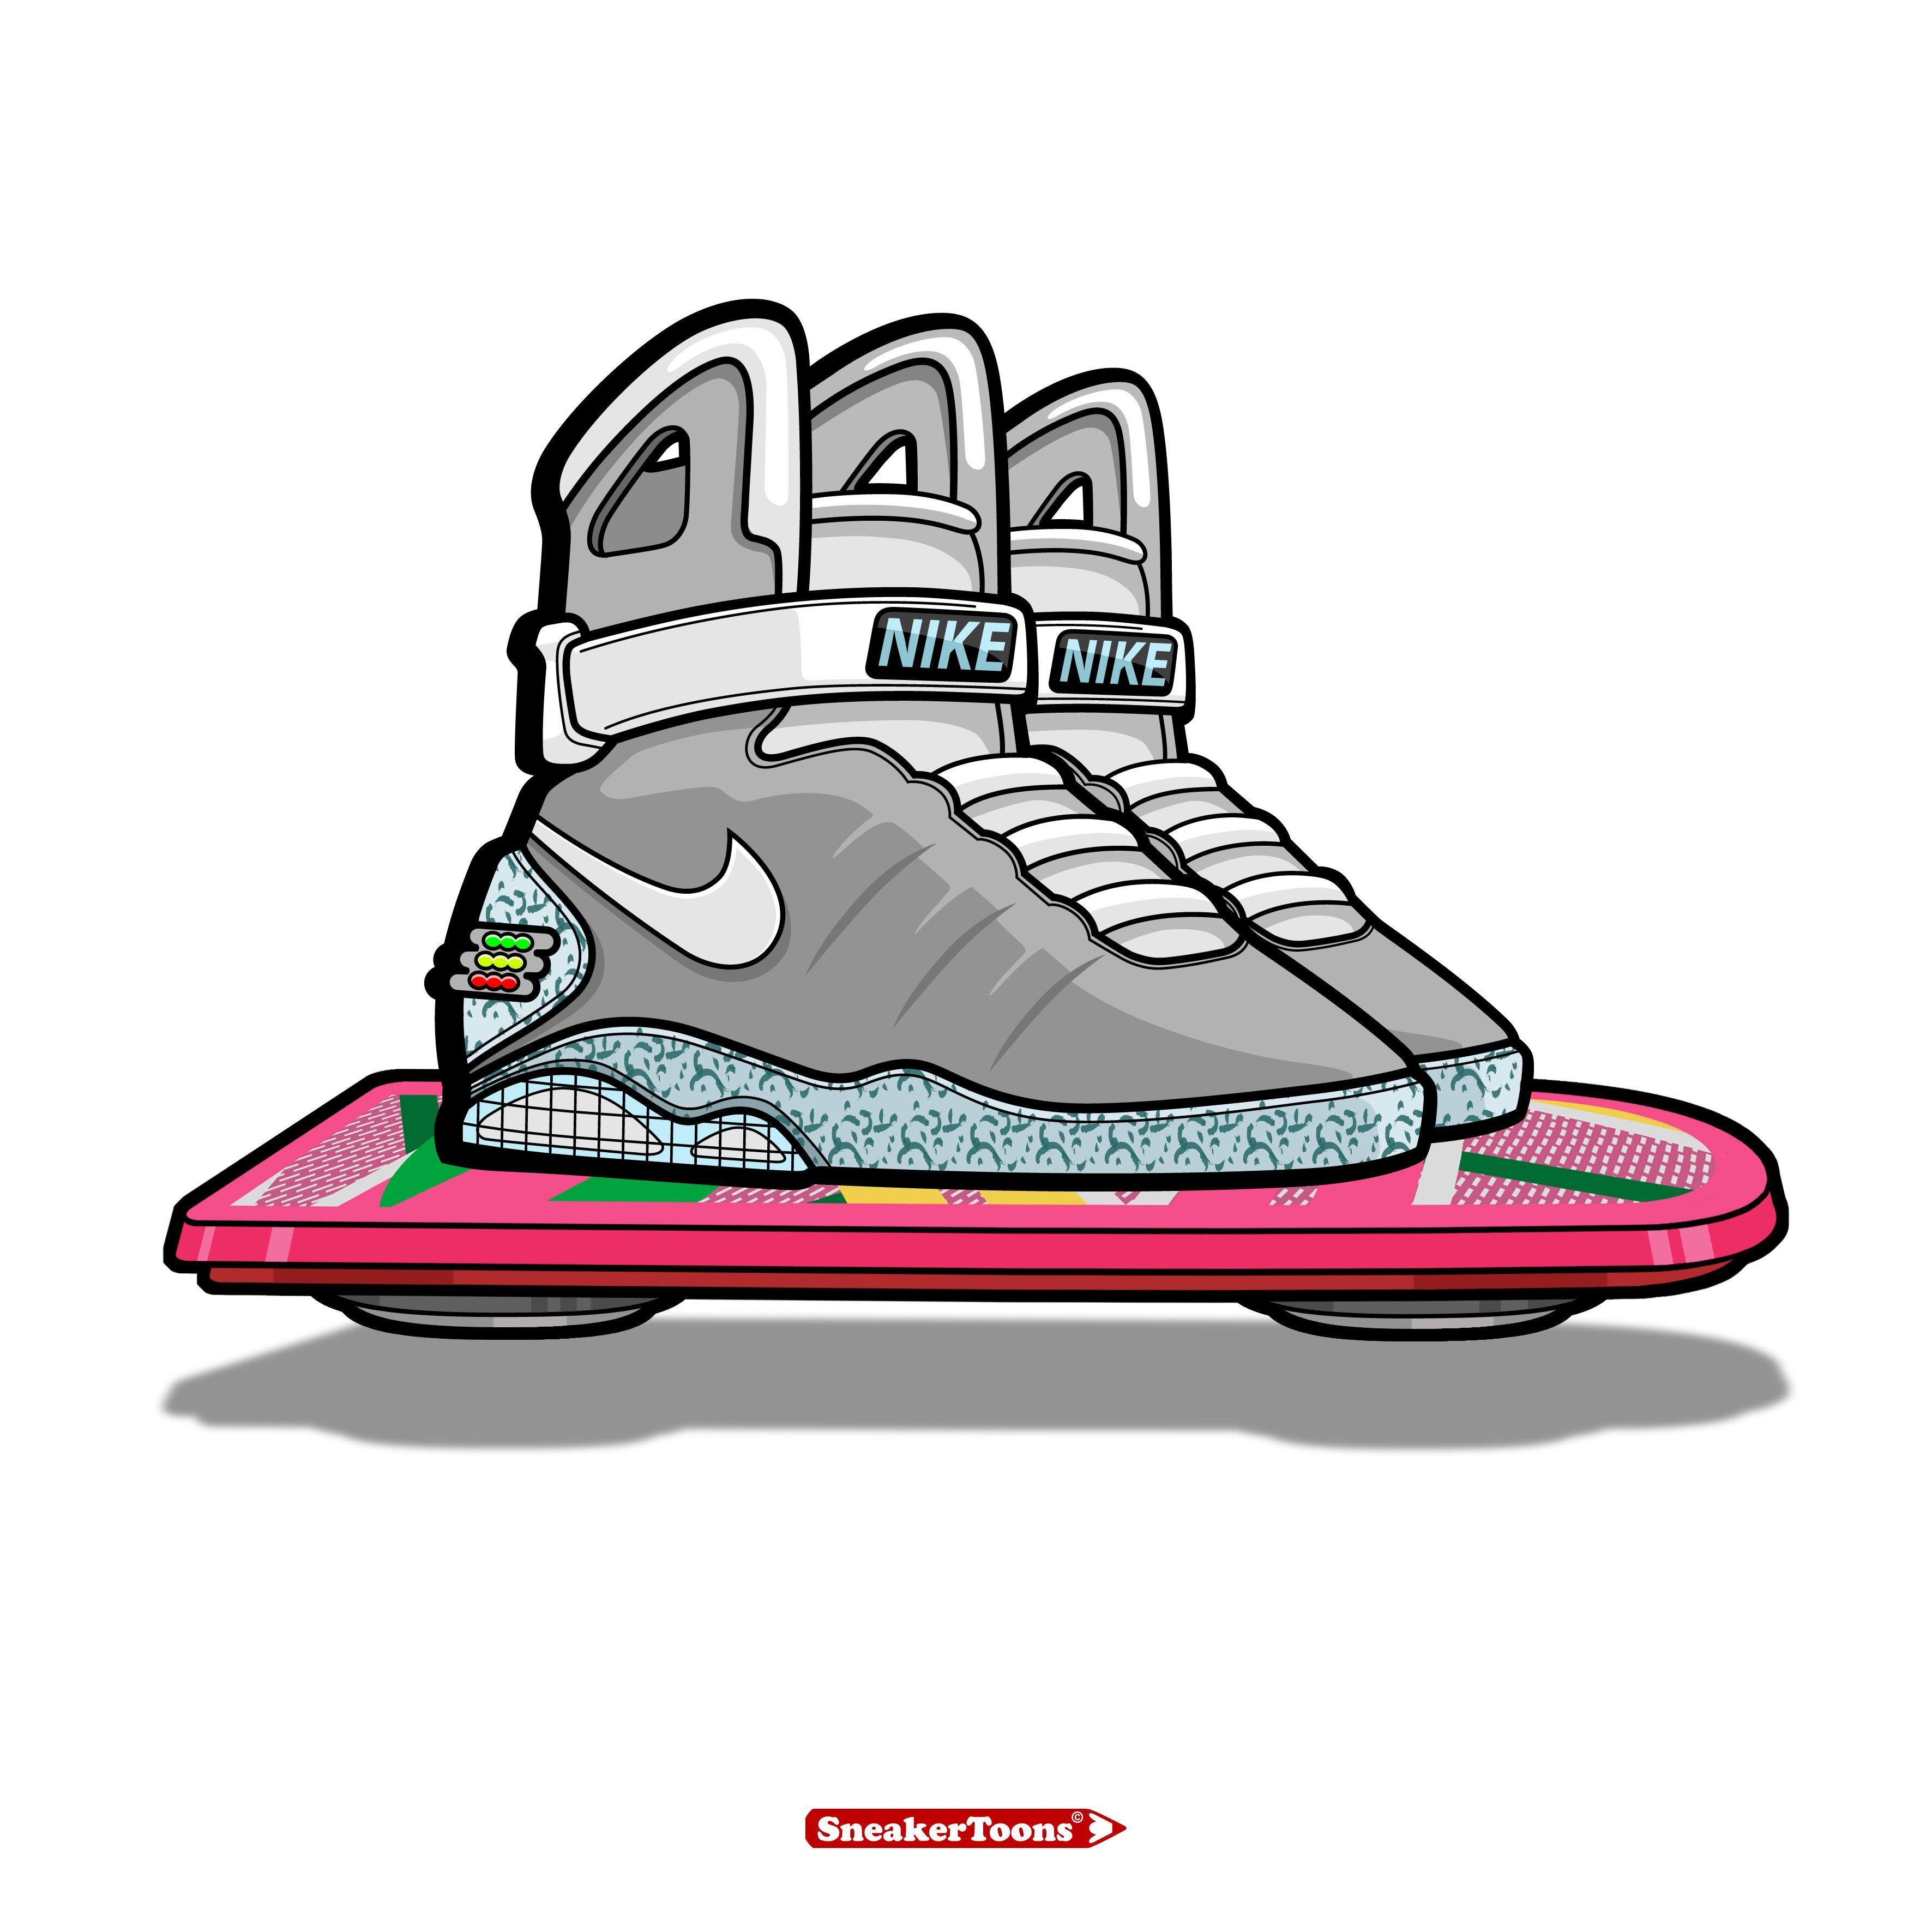 Nike Air Mag by Steven Piantoni / Sneakertoons & Matchkicks (UK)